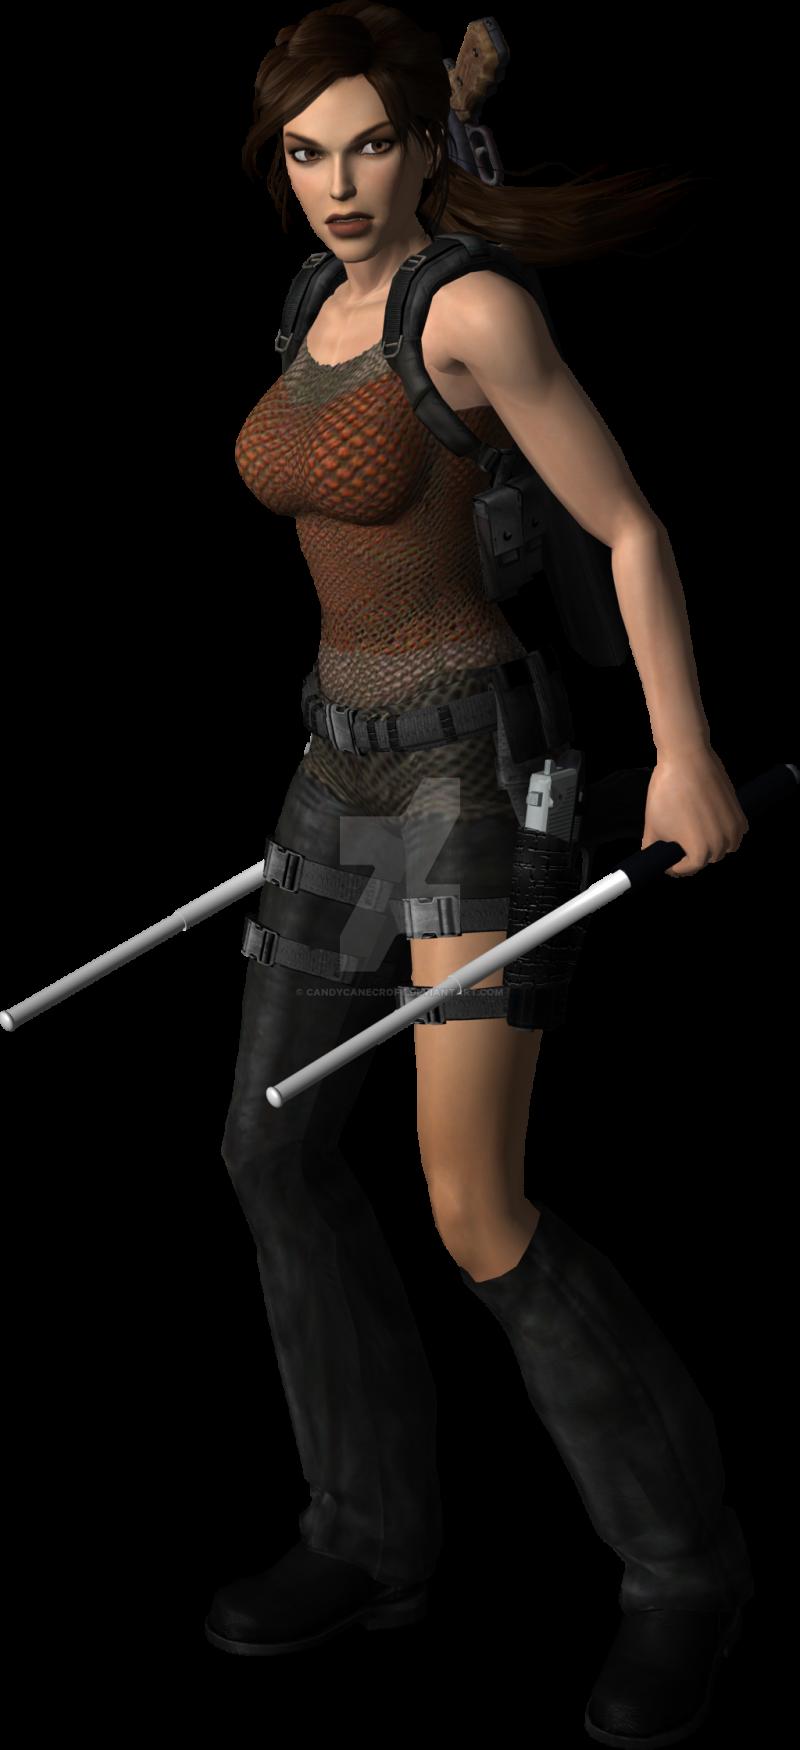 Lara Croft    Tomb Raider PNG Image